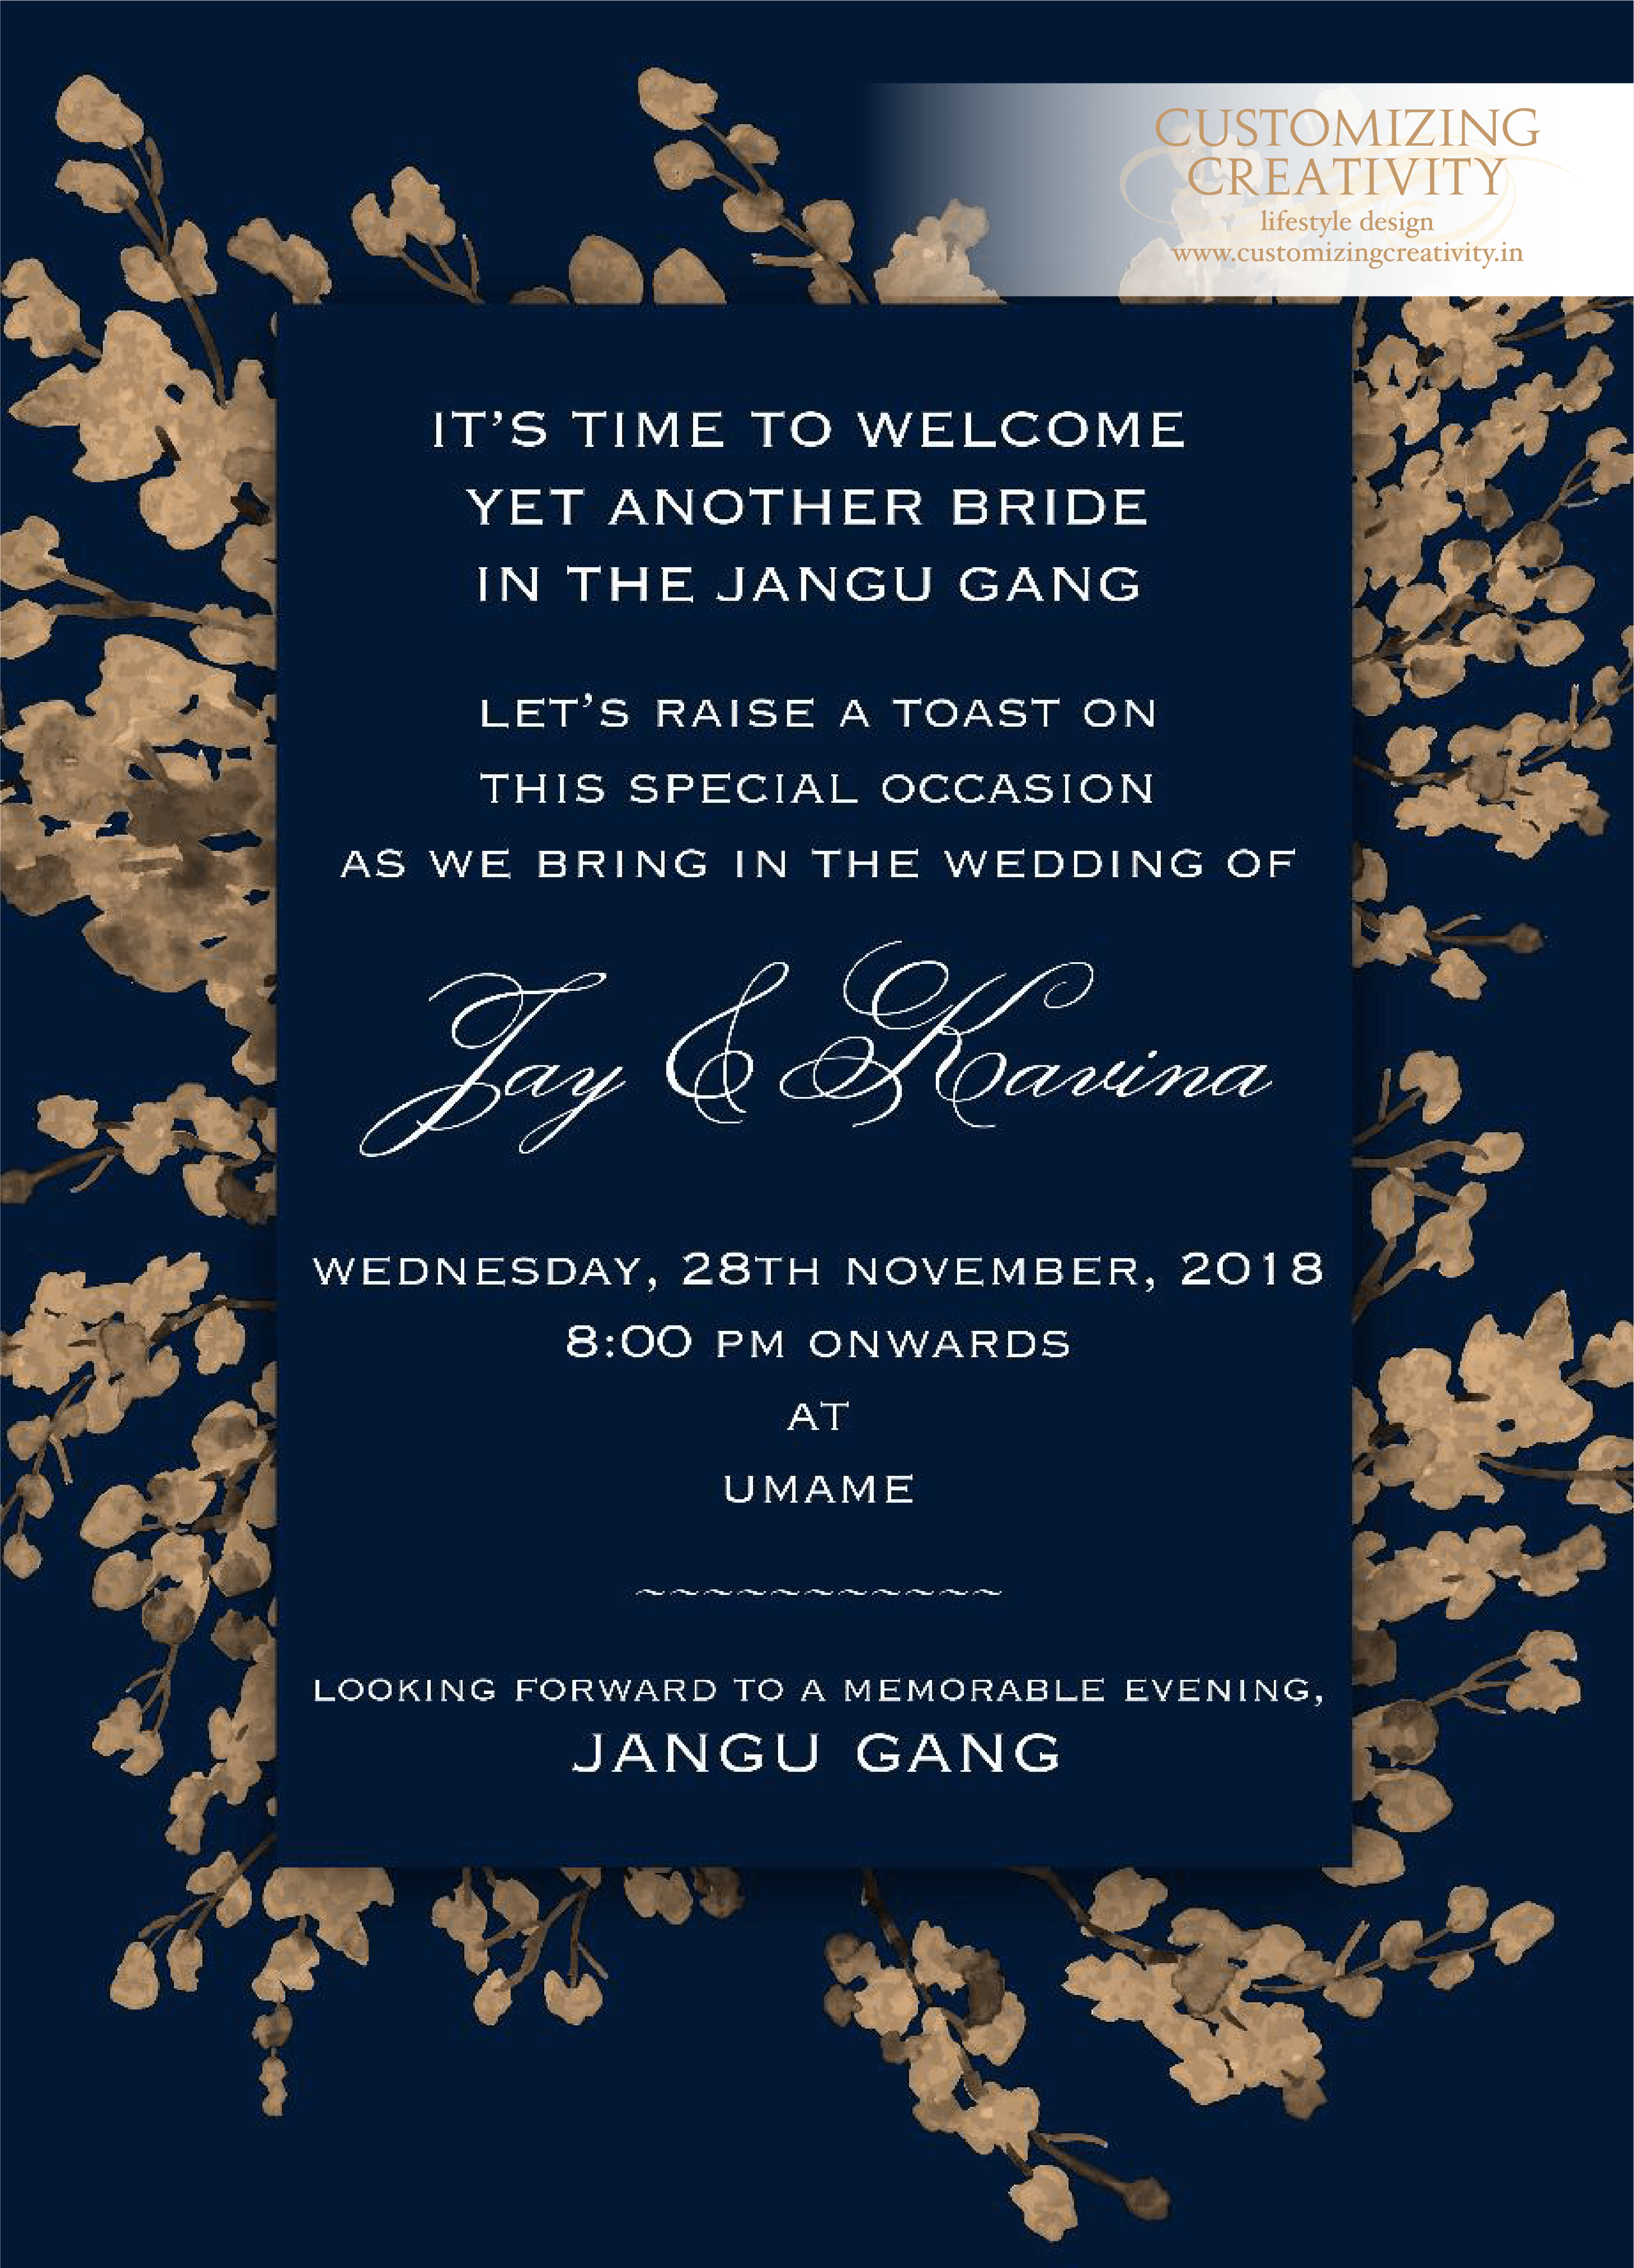 Wedding Invitation Cards Indian Wedding Cards Invites Wedding Stationery E I Unique Wedding Invitation Wording Simple Wedding Cards Wedding Invitations Diy